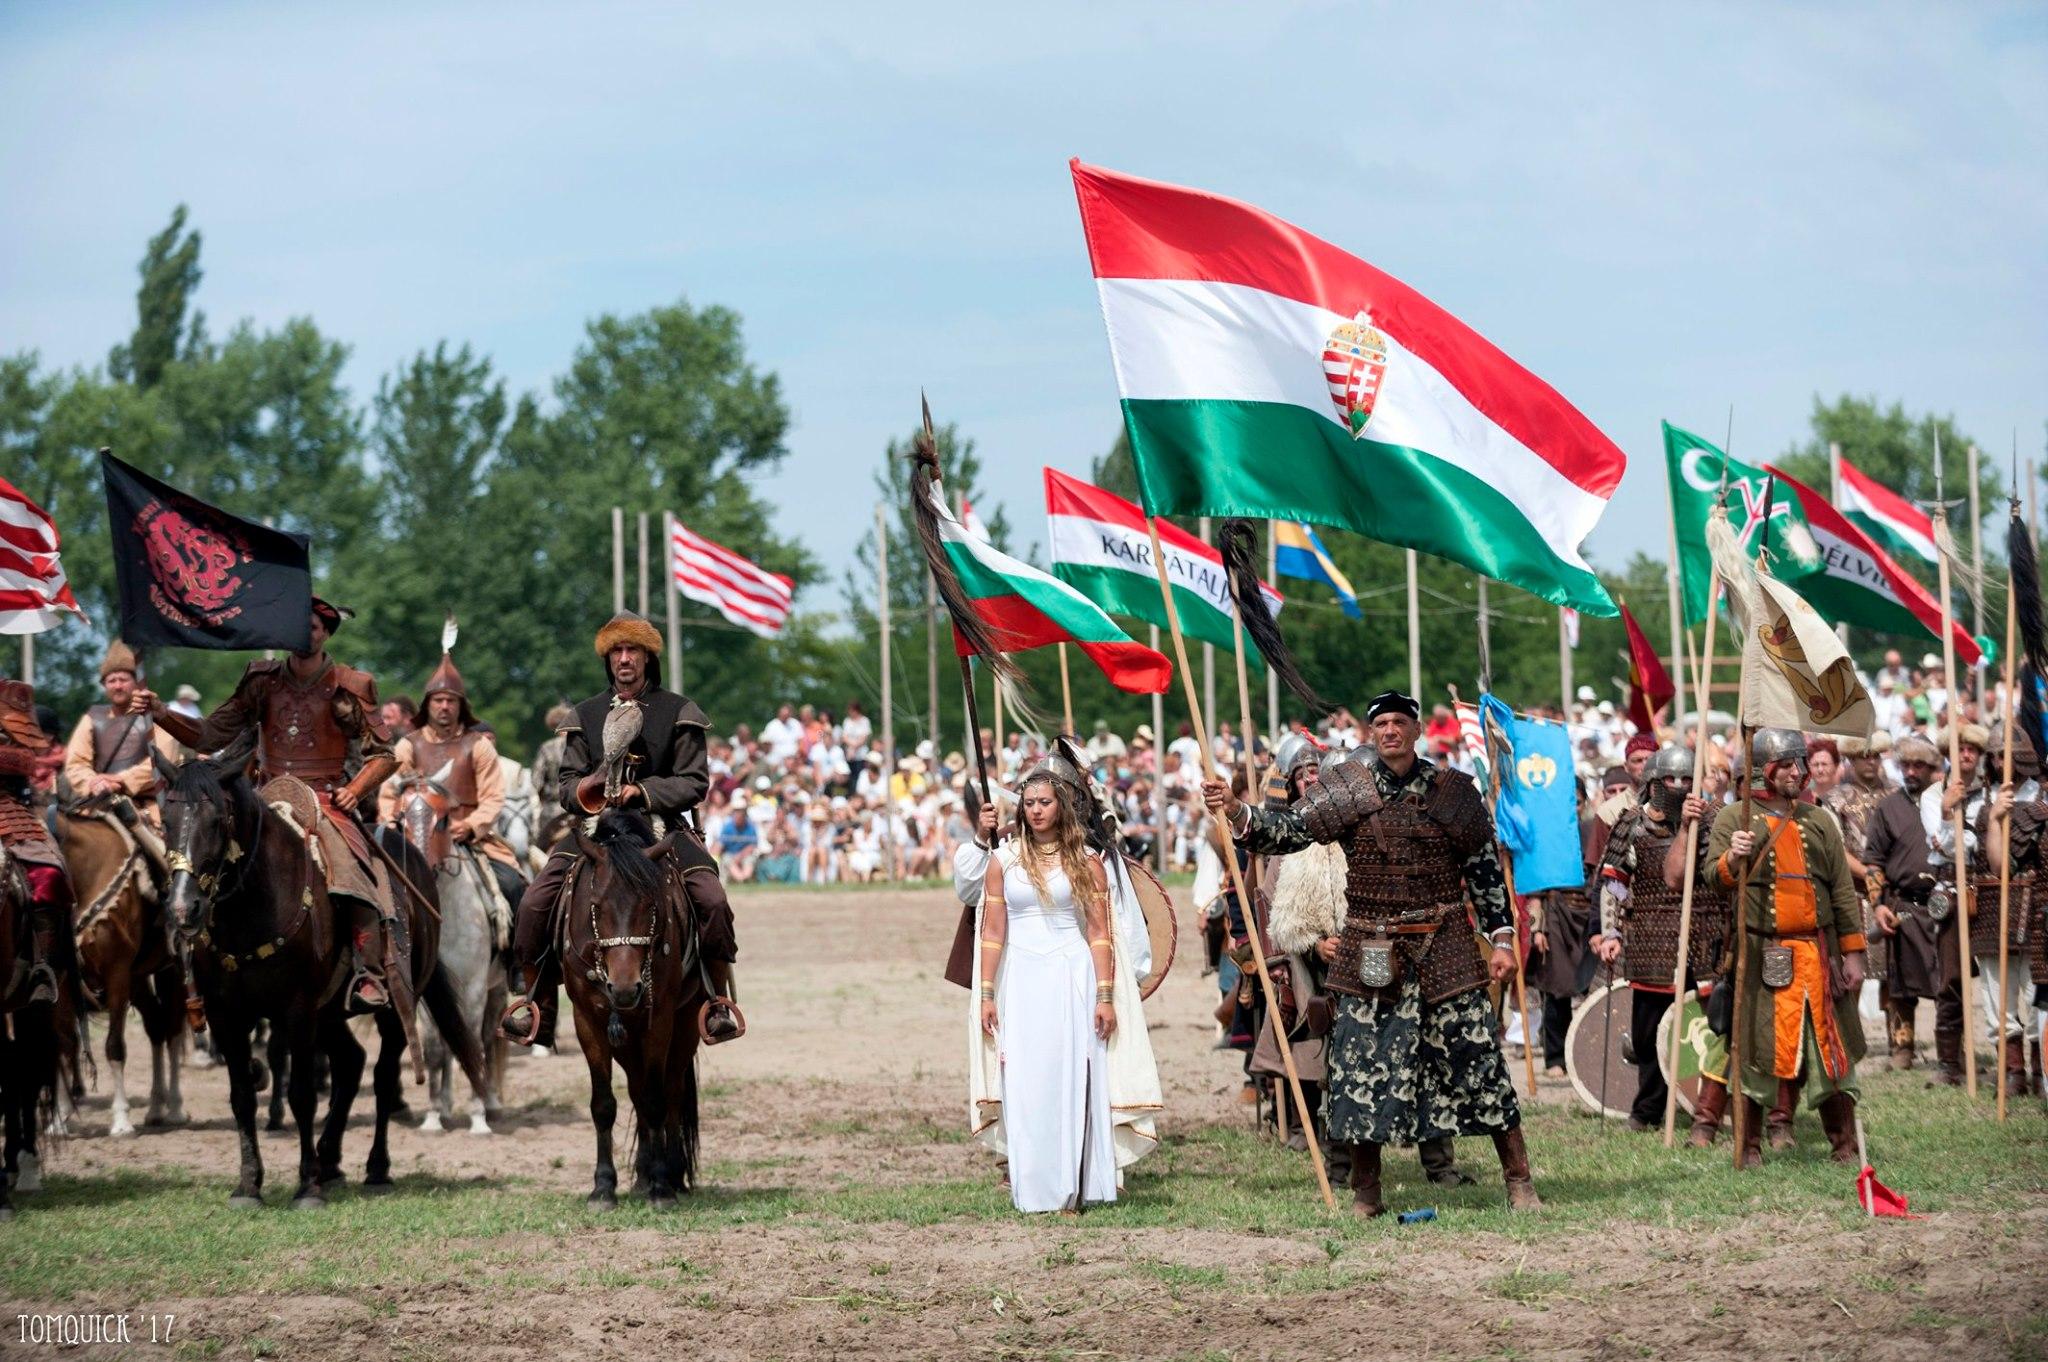 Bugac Hungary travel tourism